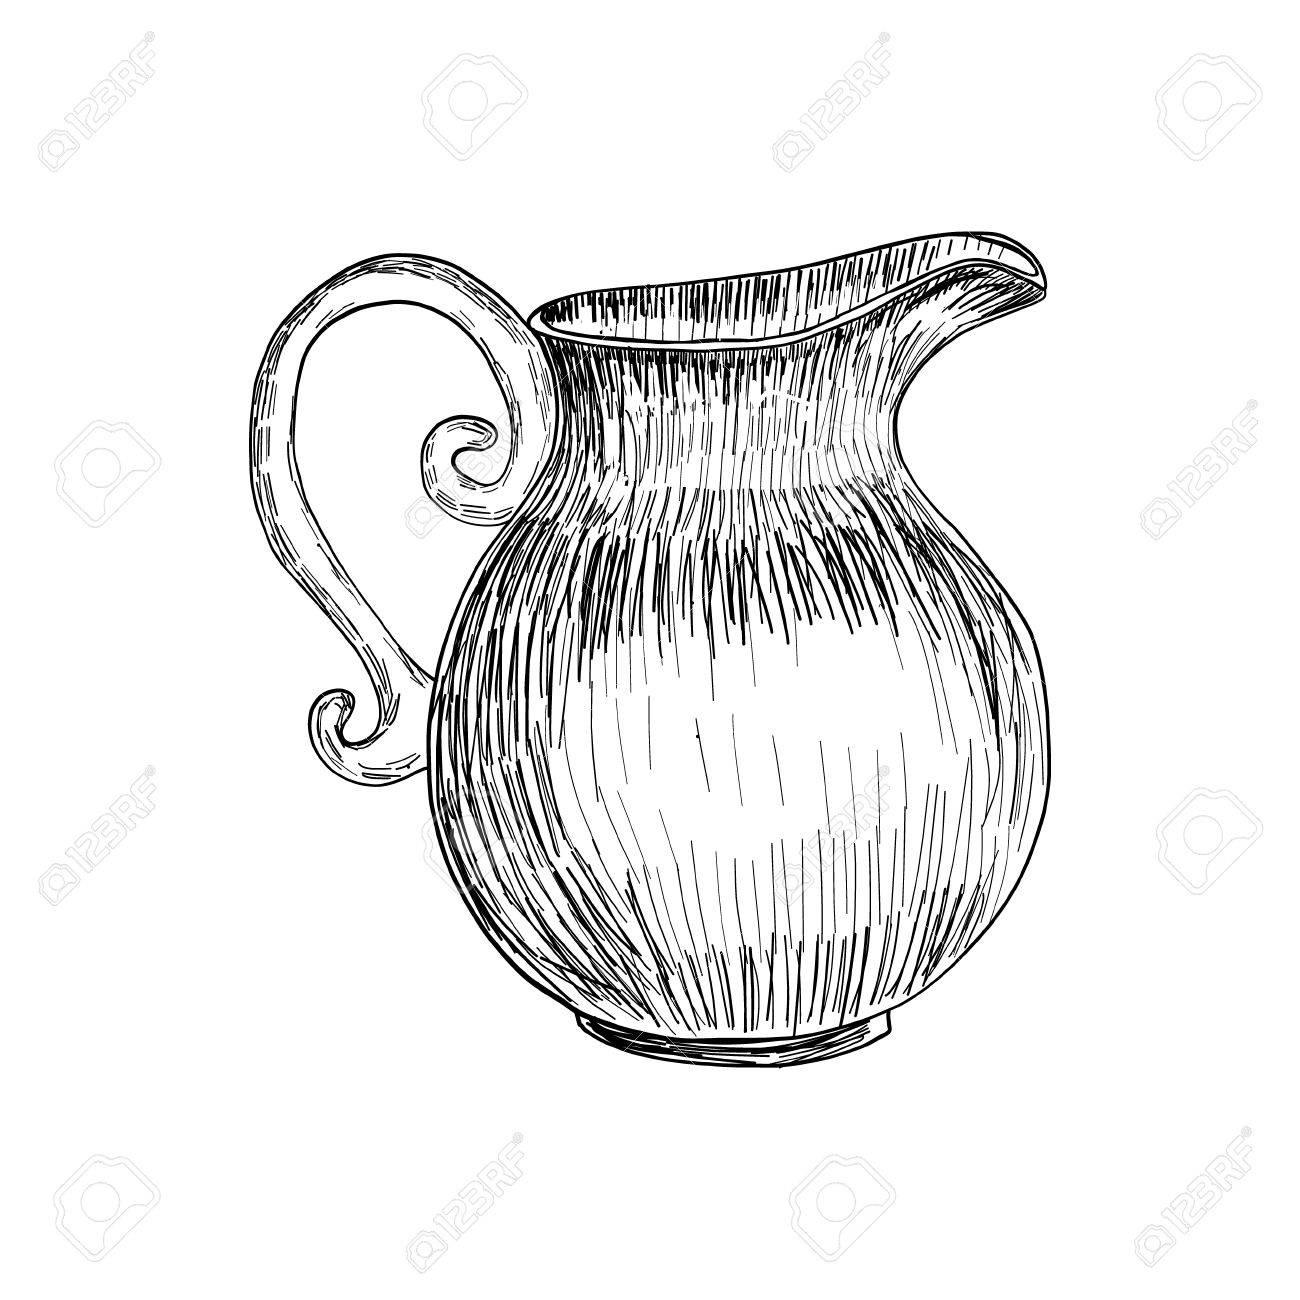 Sketch of milk jug isolated hand drawn illustration vector